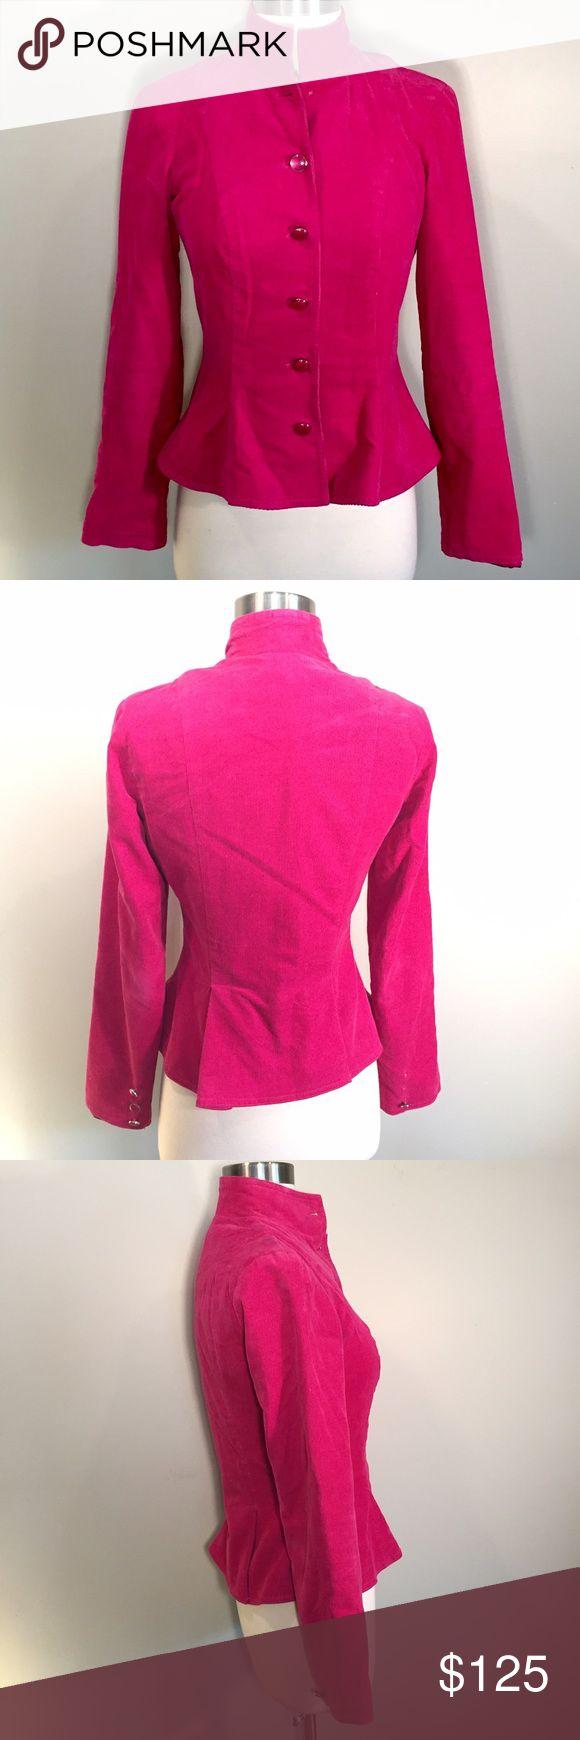 Betsy Johnson UK pink corduroy peplum jacket Betsy Johnson UK pink corduroy peplum jacket. Missing one button as shown in photo Betsey Johnson Jackets & Coats Blazers